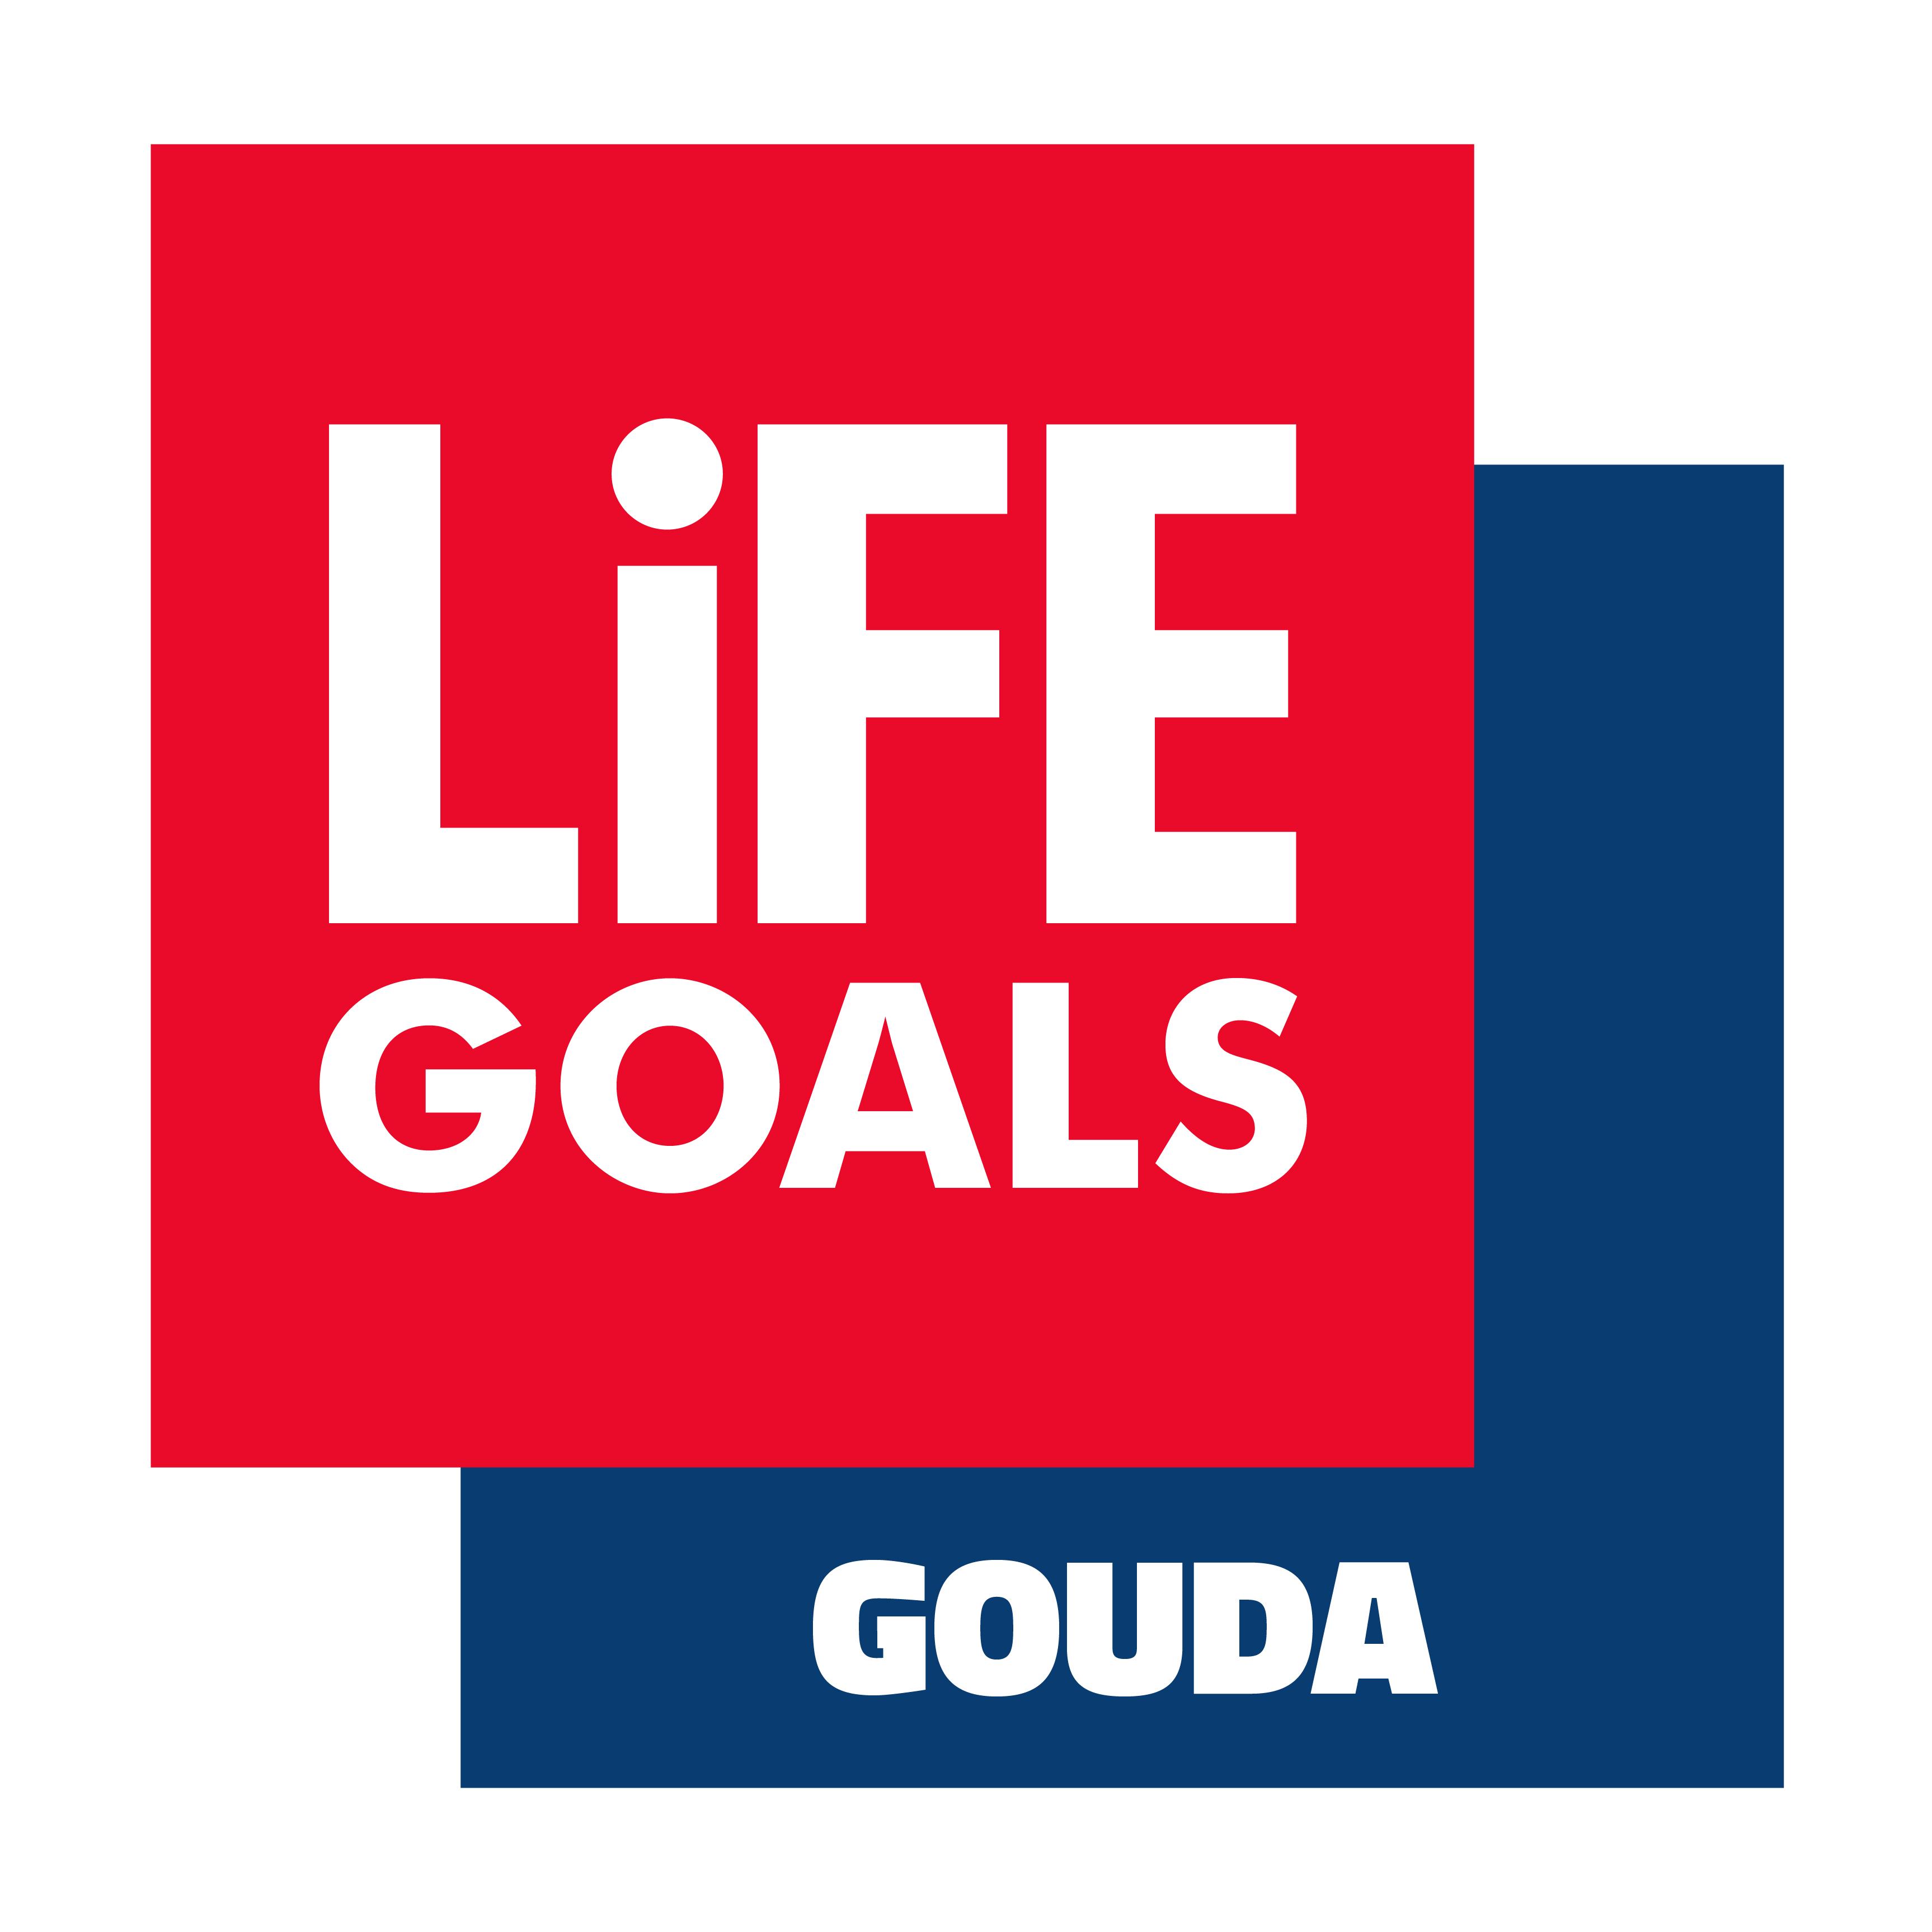 Life Goals Gouda